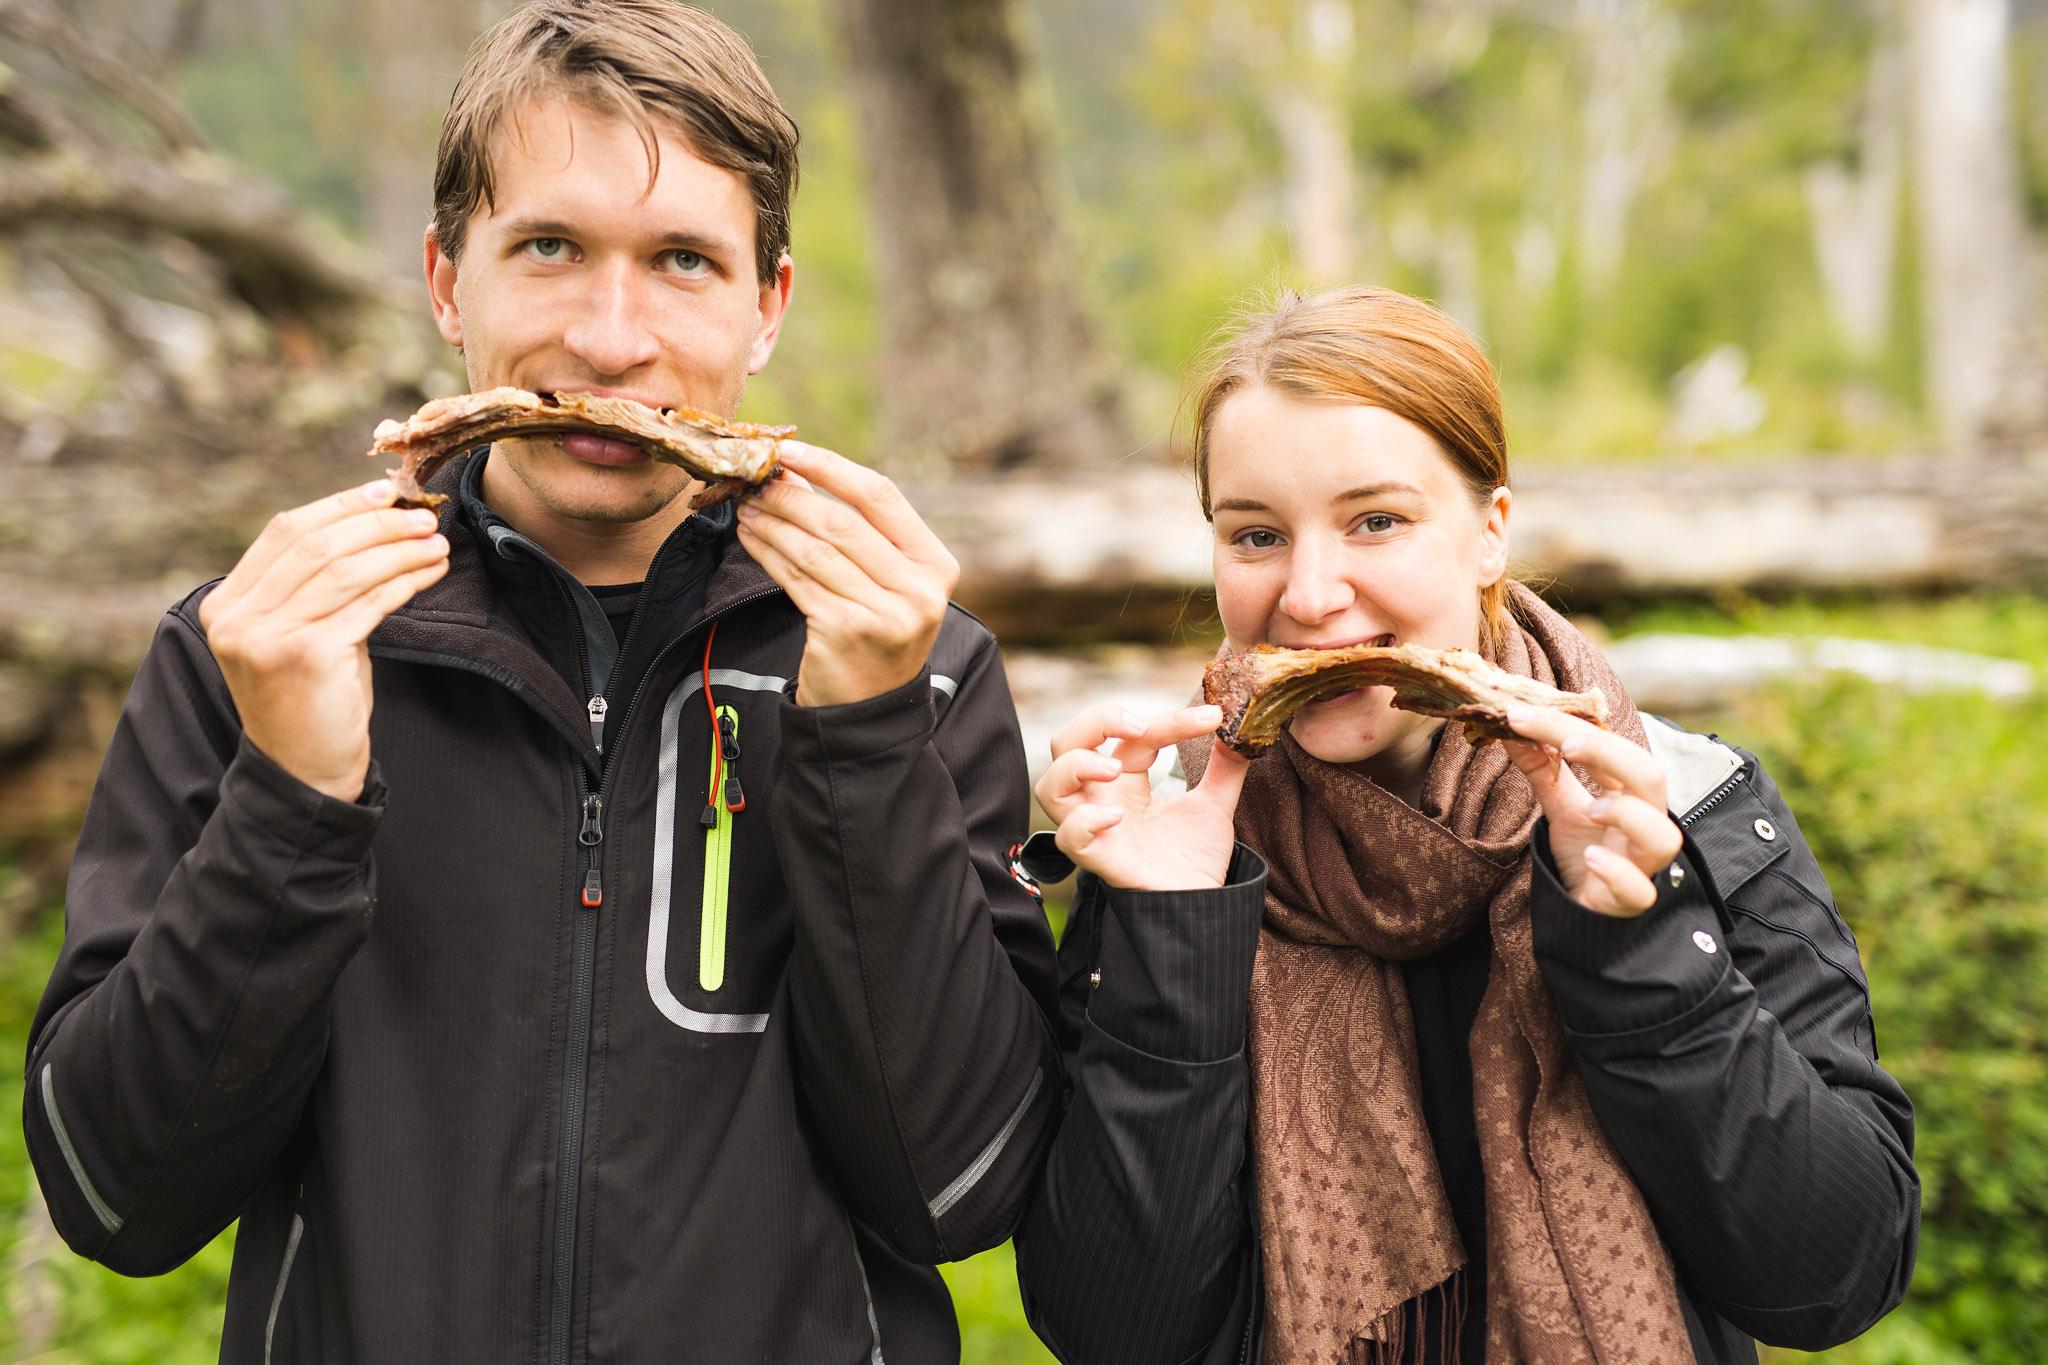 Wedding_Travellers_Ushuaia_Overlanding_fin_del_mundo-laguna-esmeralda-meat-lovers-couple-asado